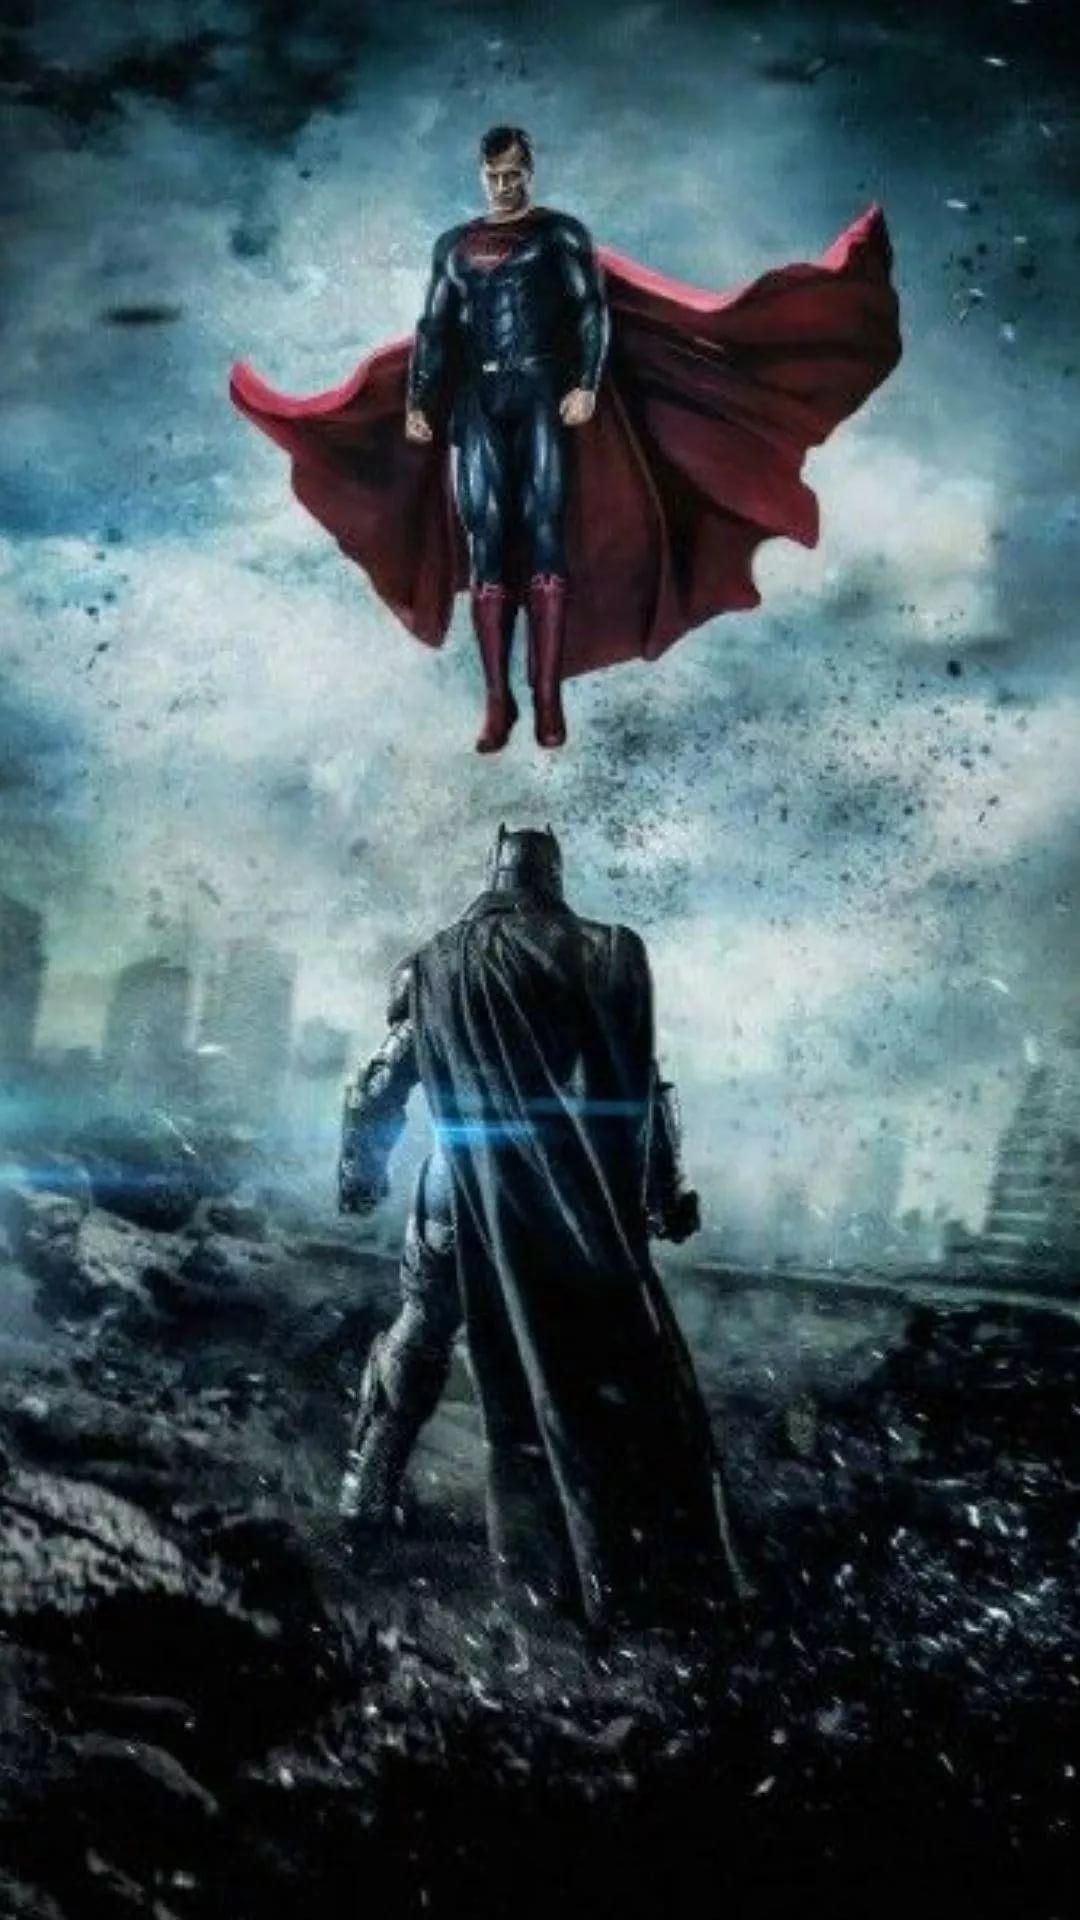 Superman phone wallpaper hd